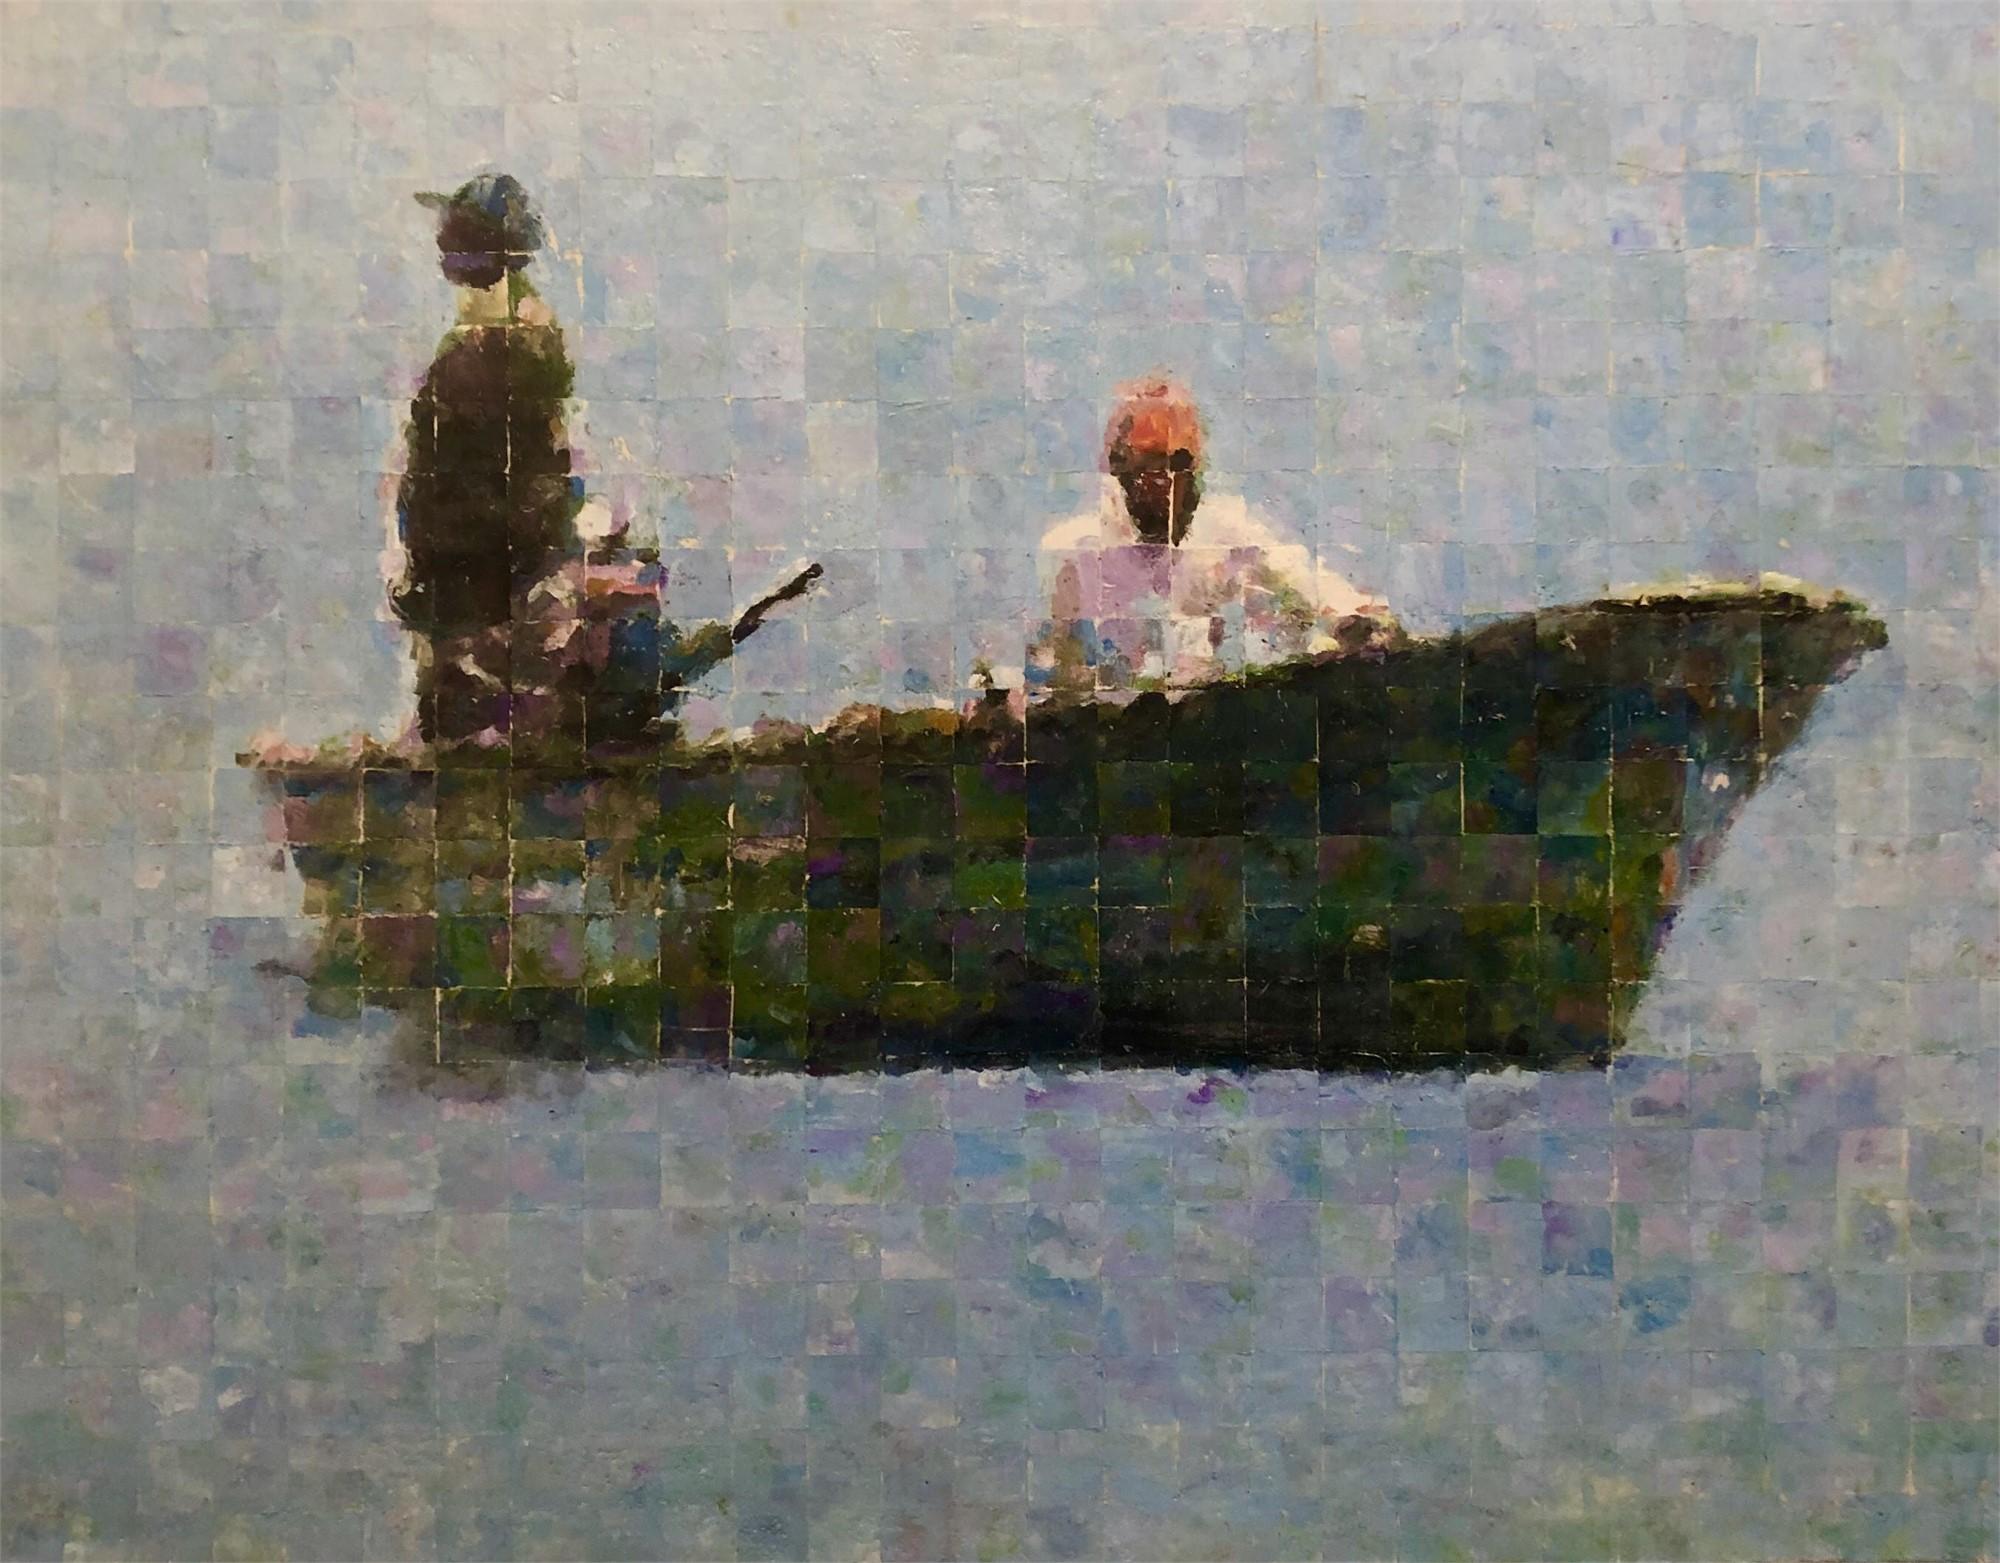 The Fisherman of Guayabitos by Mark Gaskin